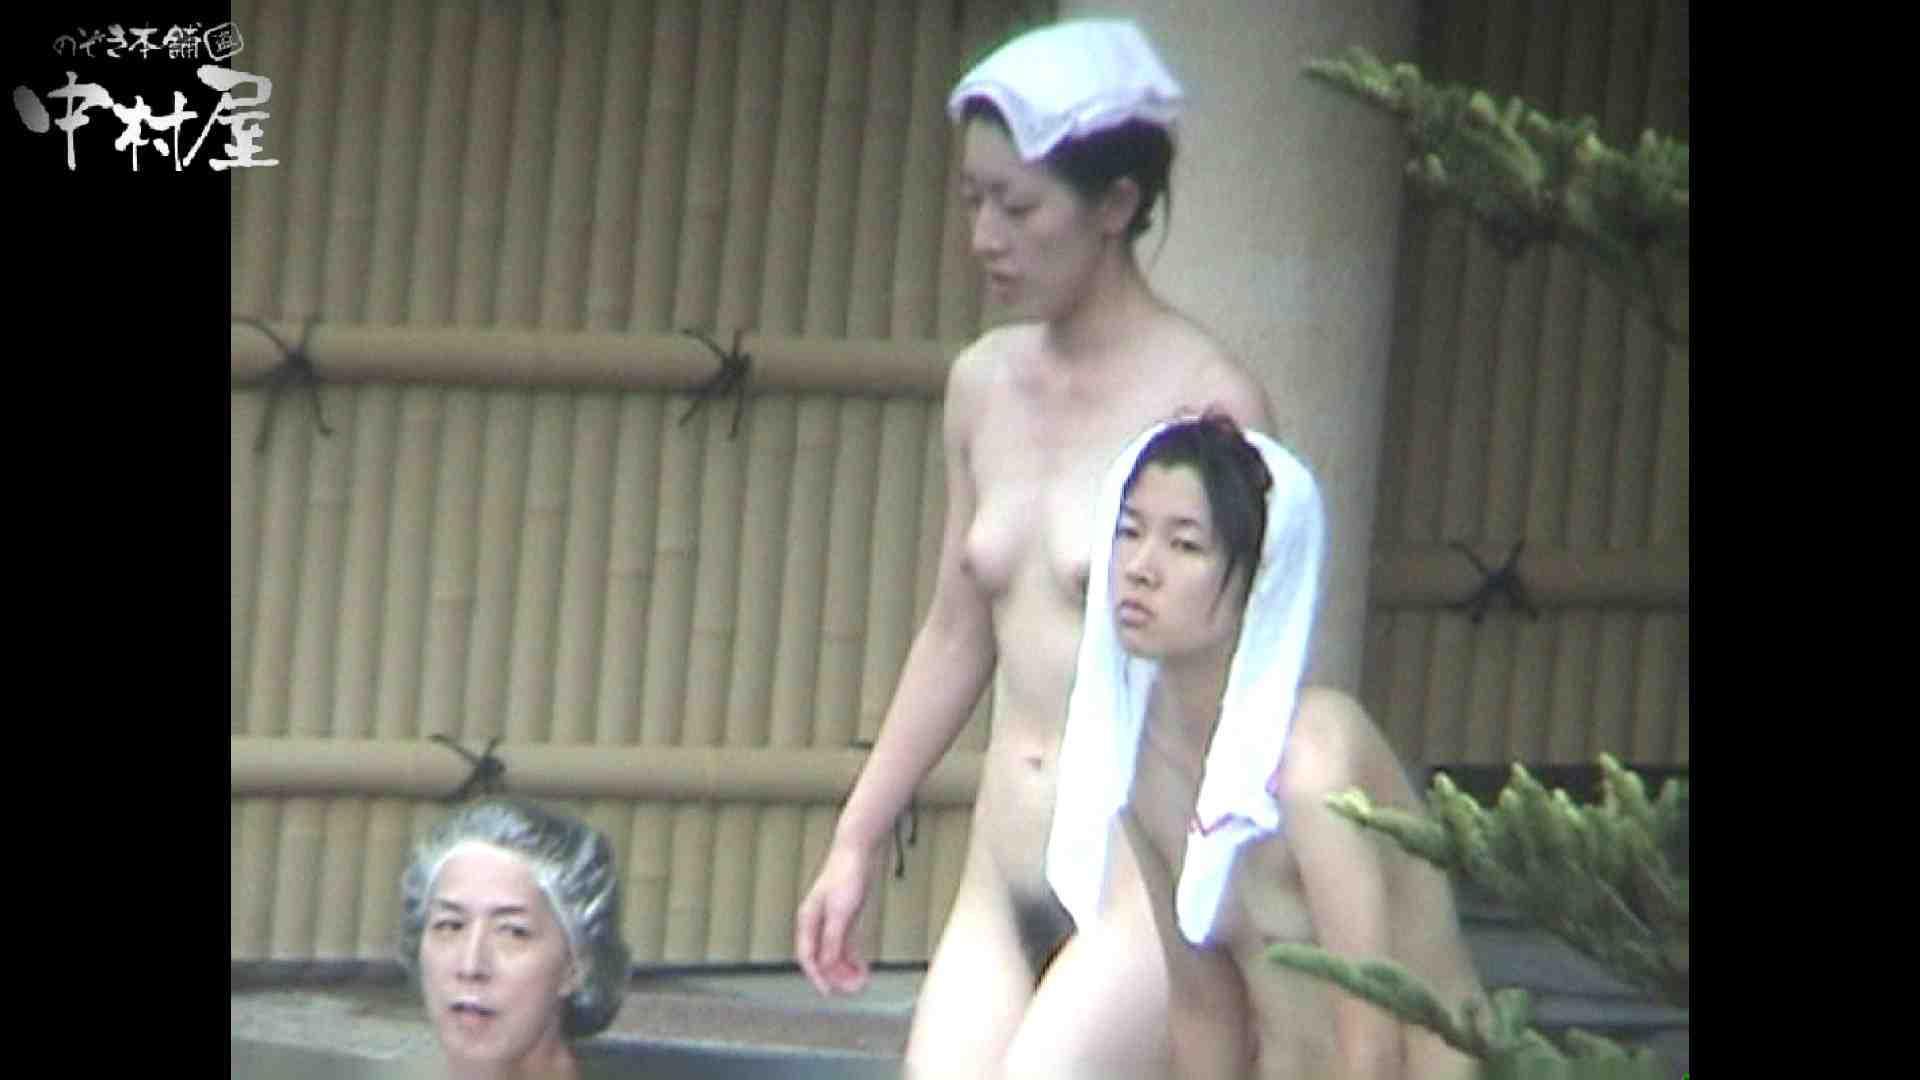 Aquaな露天風呂Vol.960 盗撮シリーズ   露天風呂編  104PIX 1